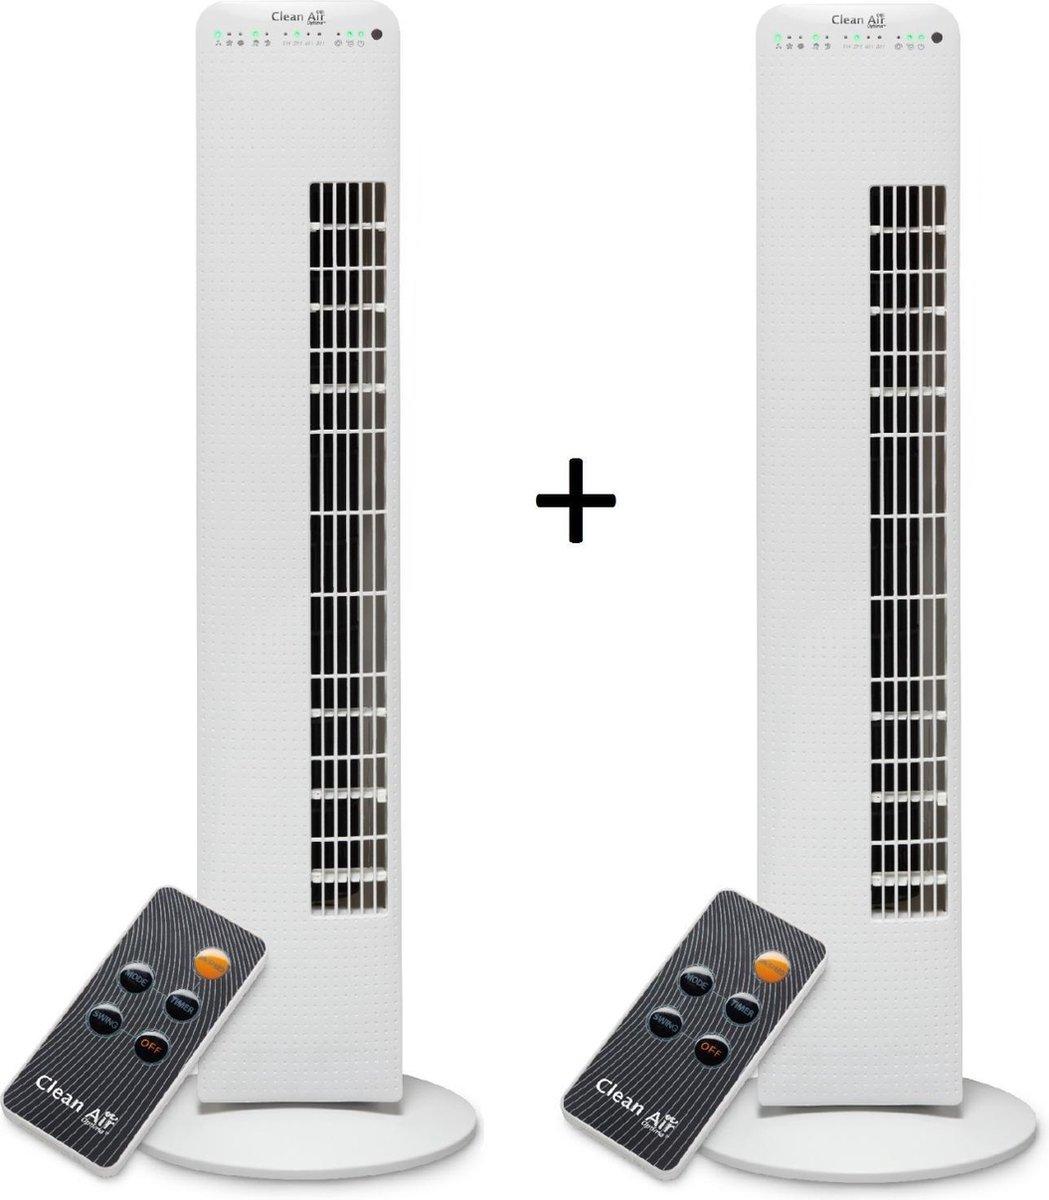 Clean Air Optima® 2 stuks CA-405 – Luxe Torenventilator – Ventilator met Ionisator